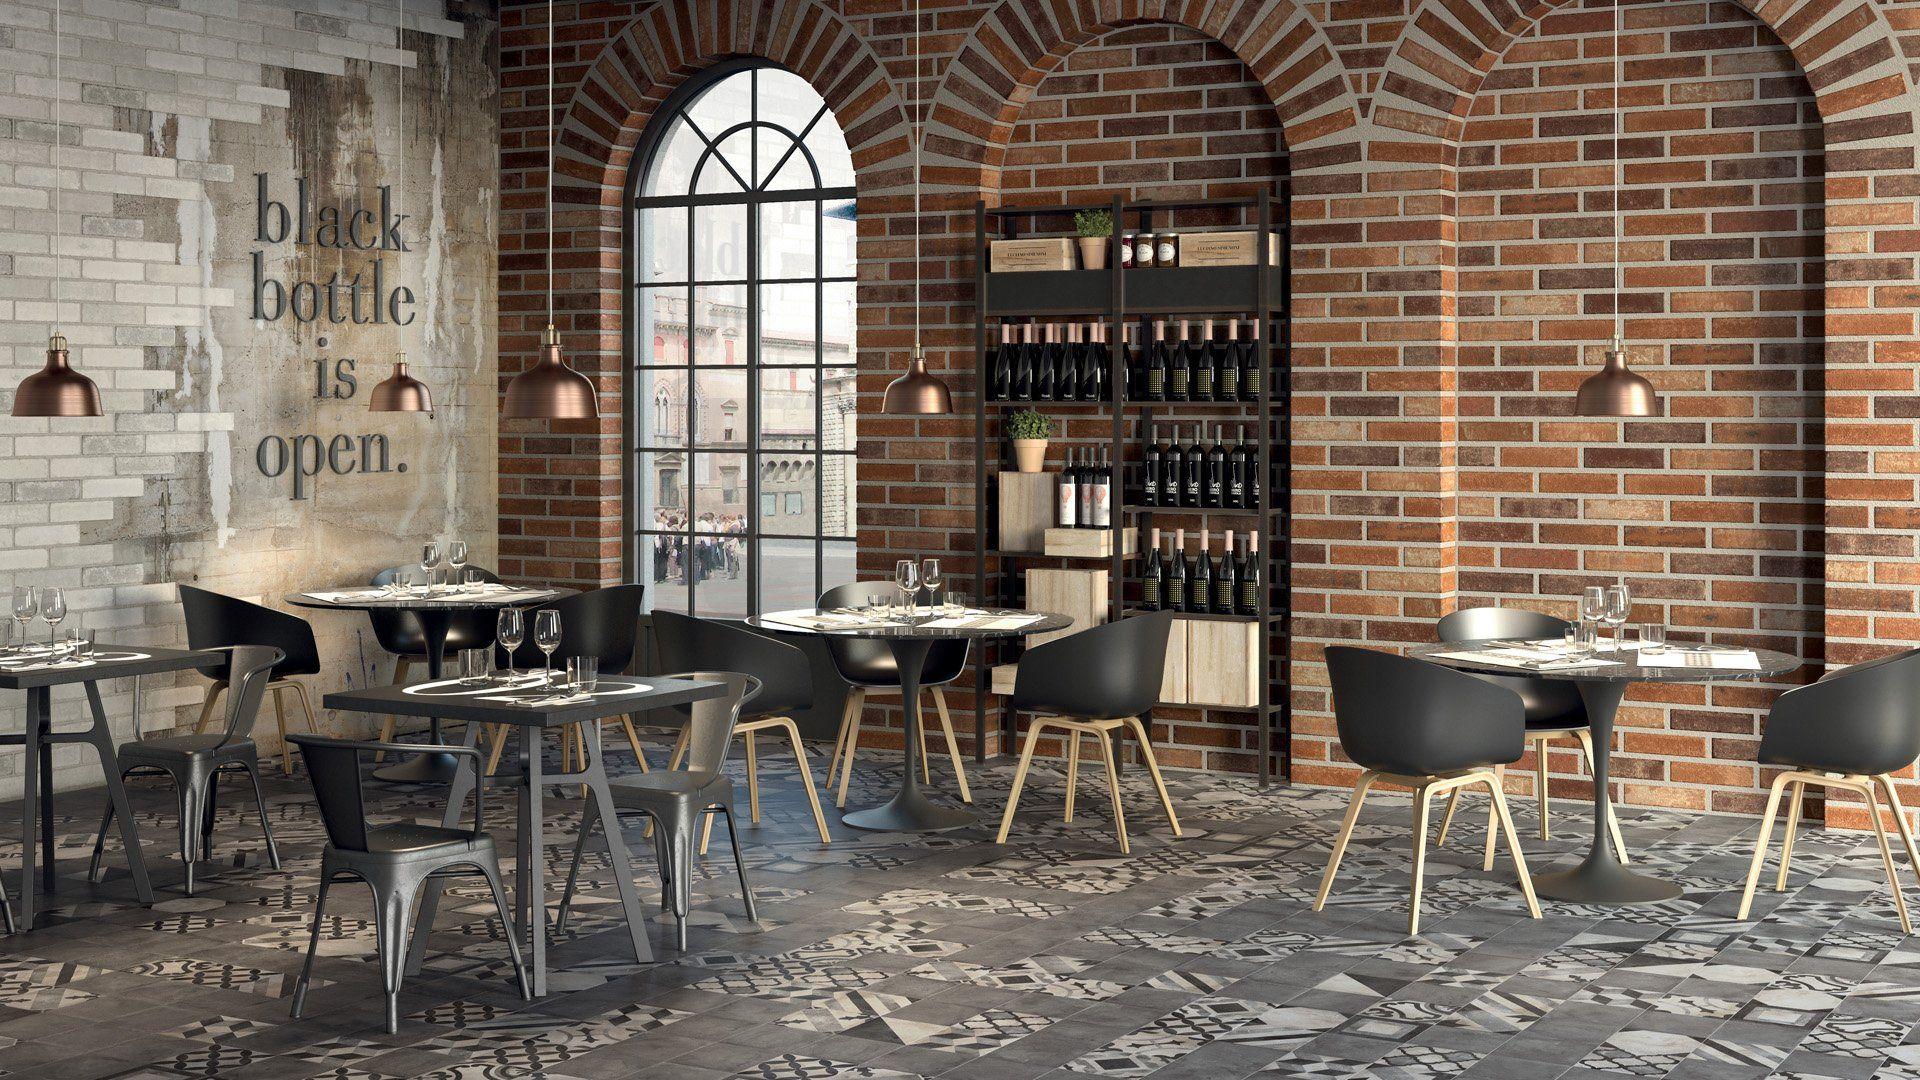 marca corona 1741 bricklane bricklane pinterest. Black Bedroom Furniture Sets. Home Design Ideas